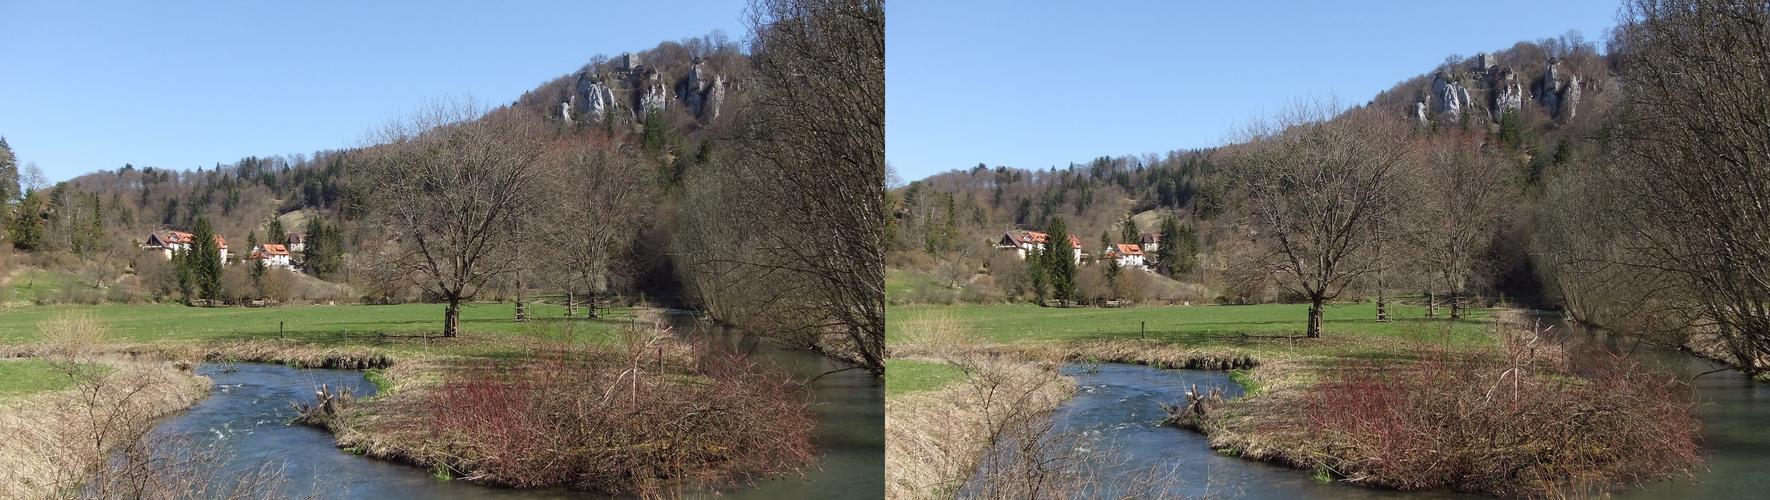 Frühling im Lautertal (Schwäb. Alb)